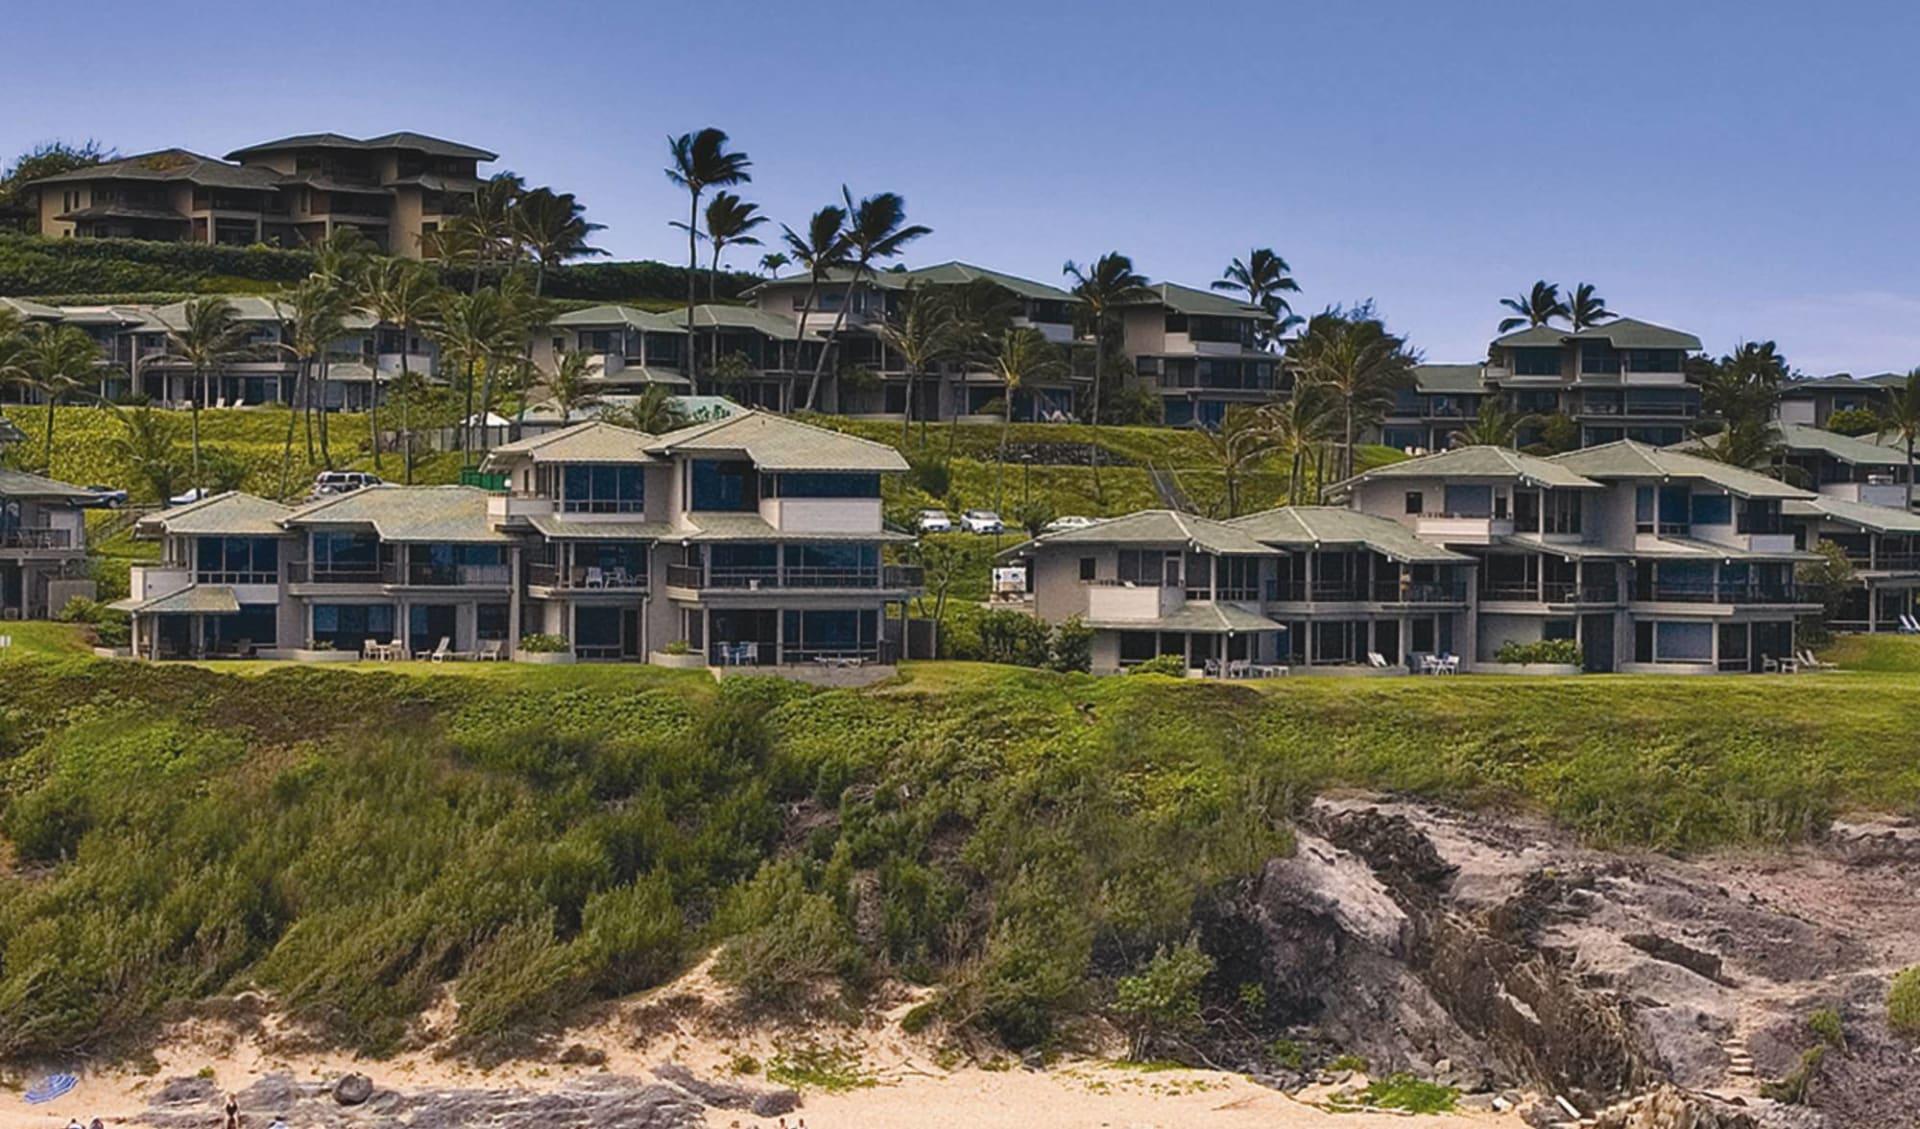 The Kapalua Villas in Kapalua - Maui: exterior the kapalua villas strand